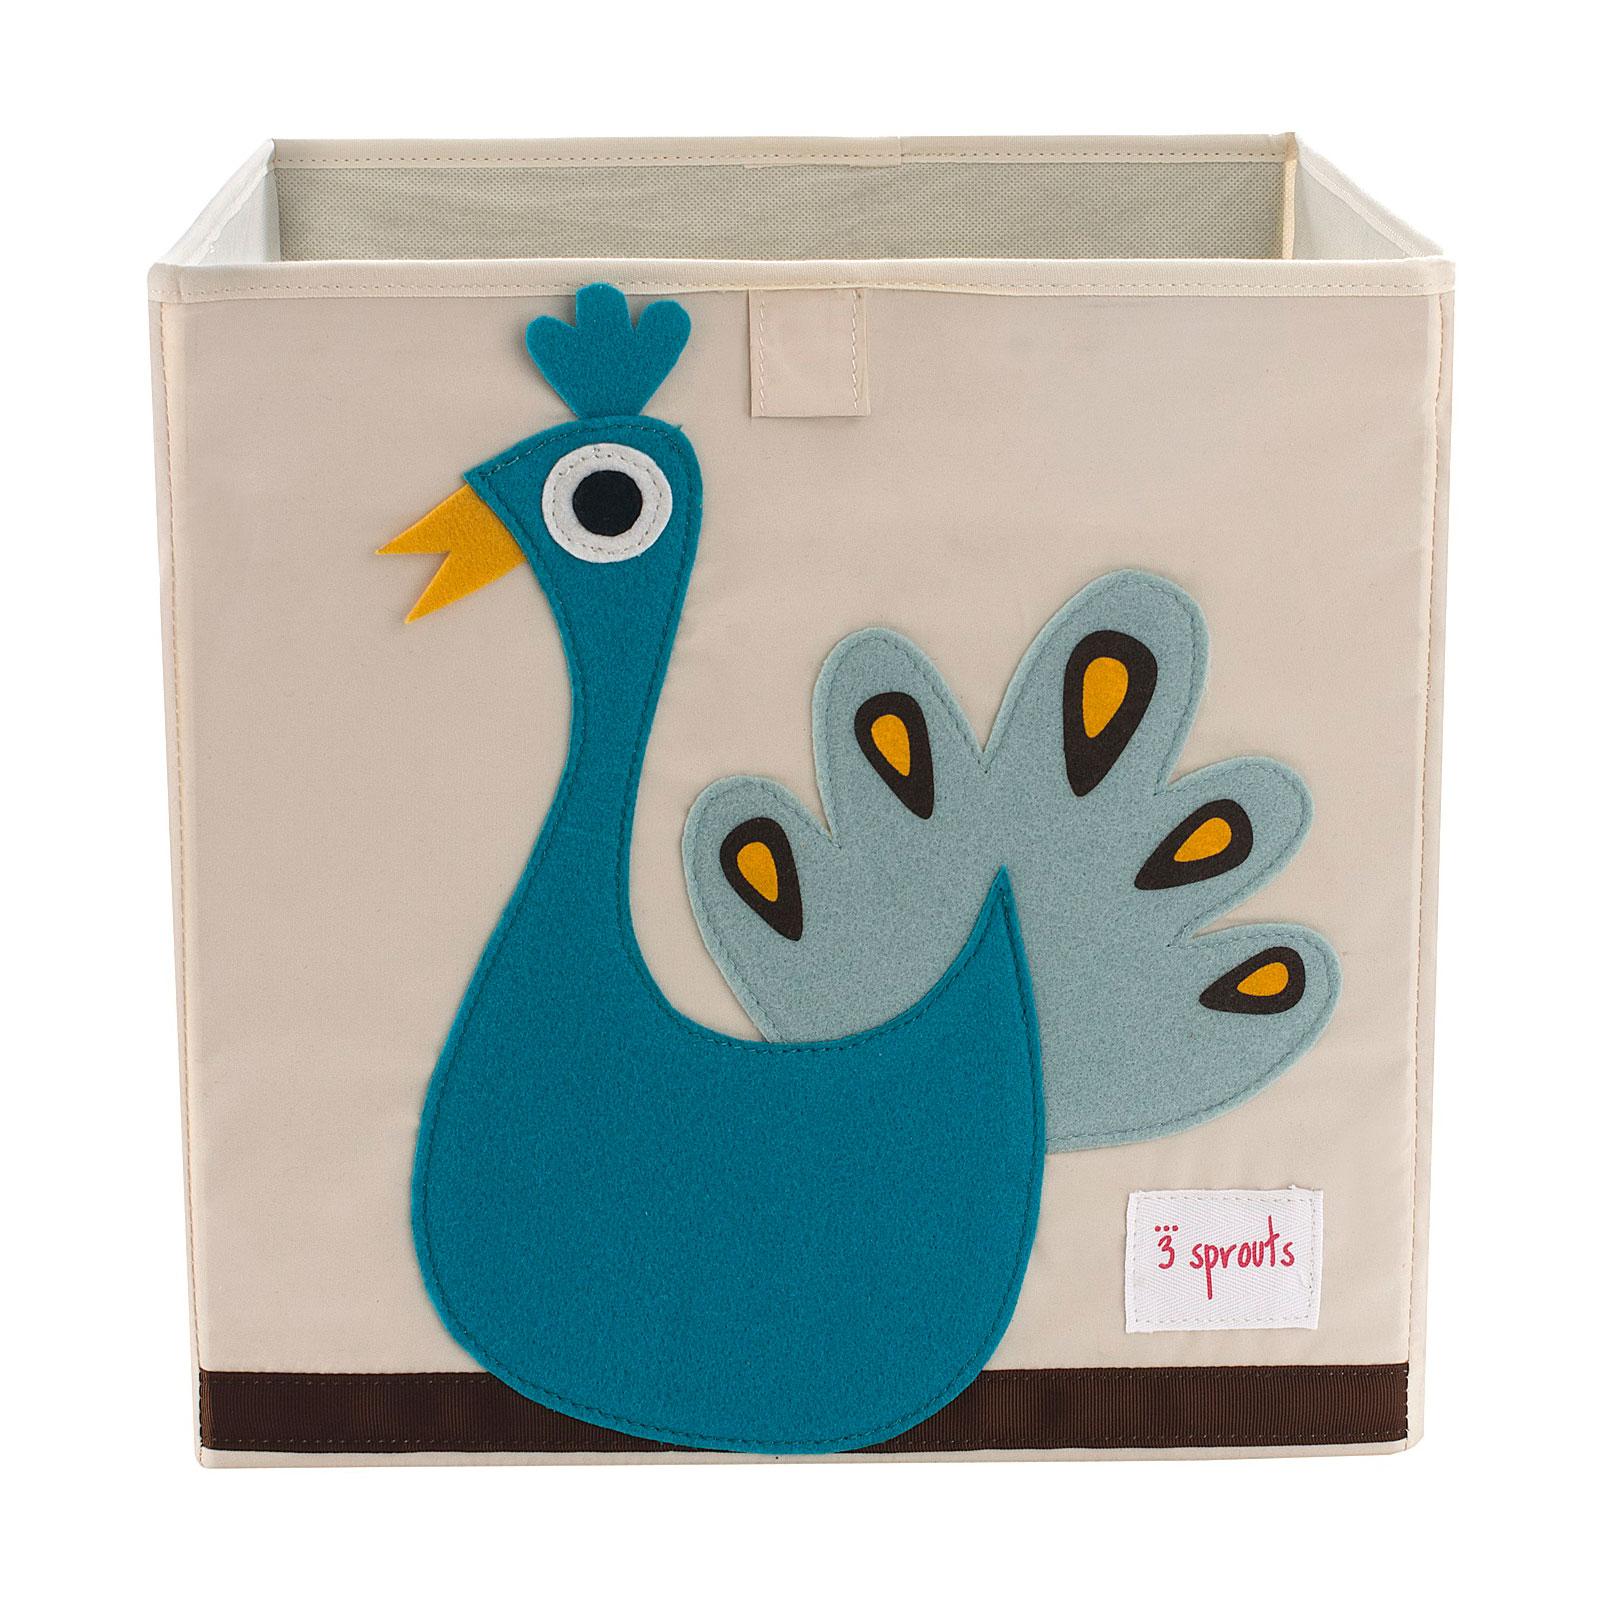 Коробка для хранения 3 Sprouts Павлин (Blue Peacock) Арт. 67641<br>